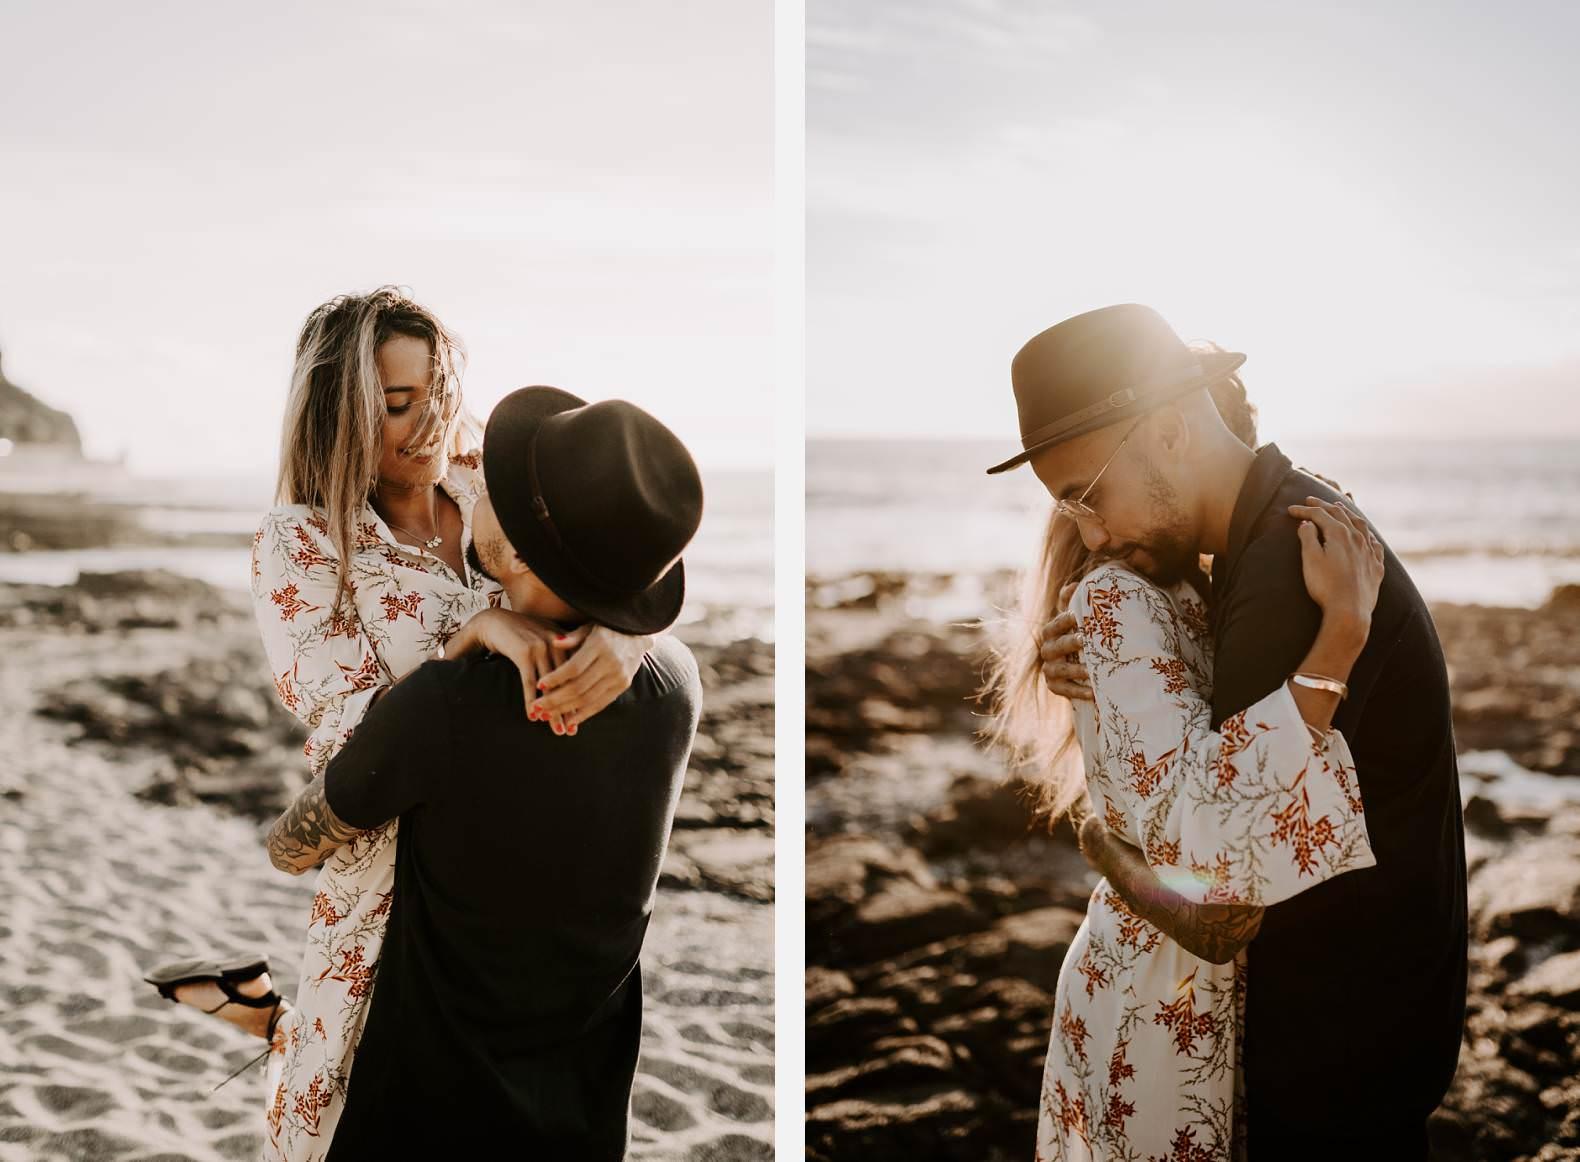 seance couple reunion cap houssaye photographe mariage bel esprit 0003 1